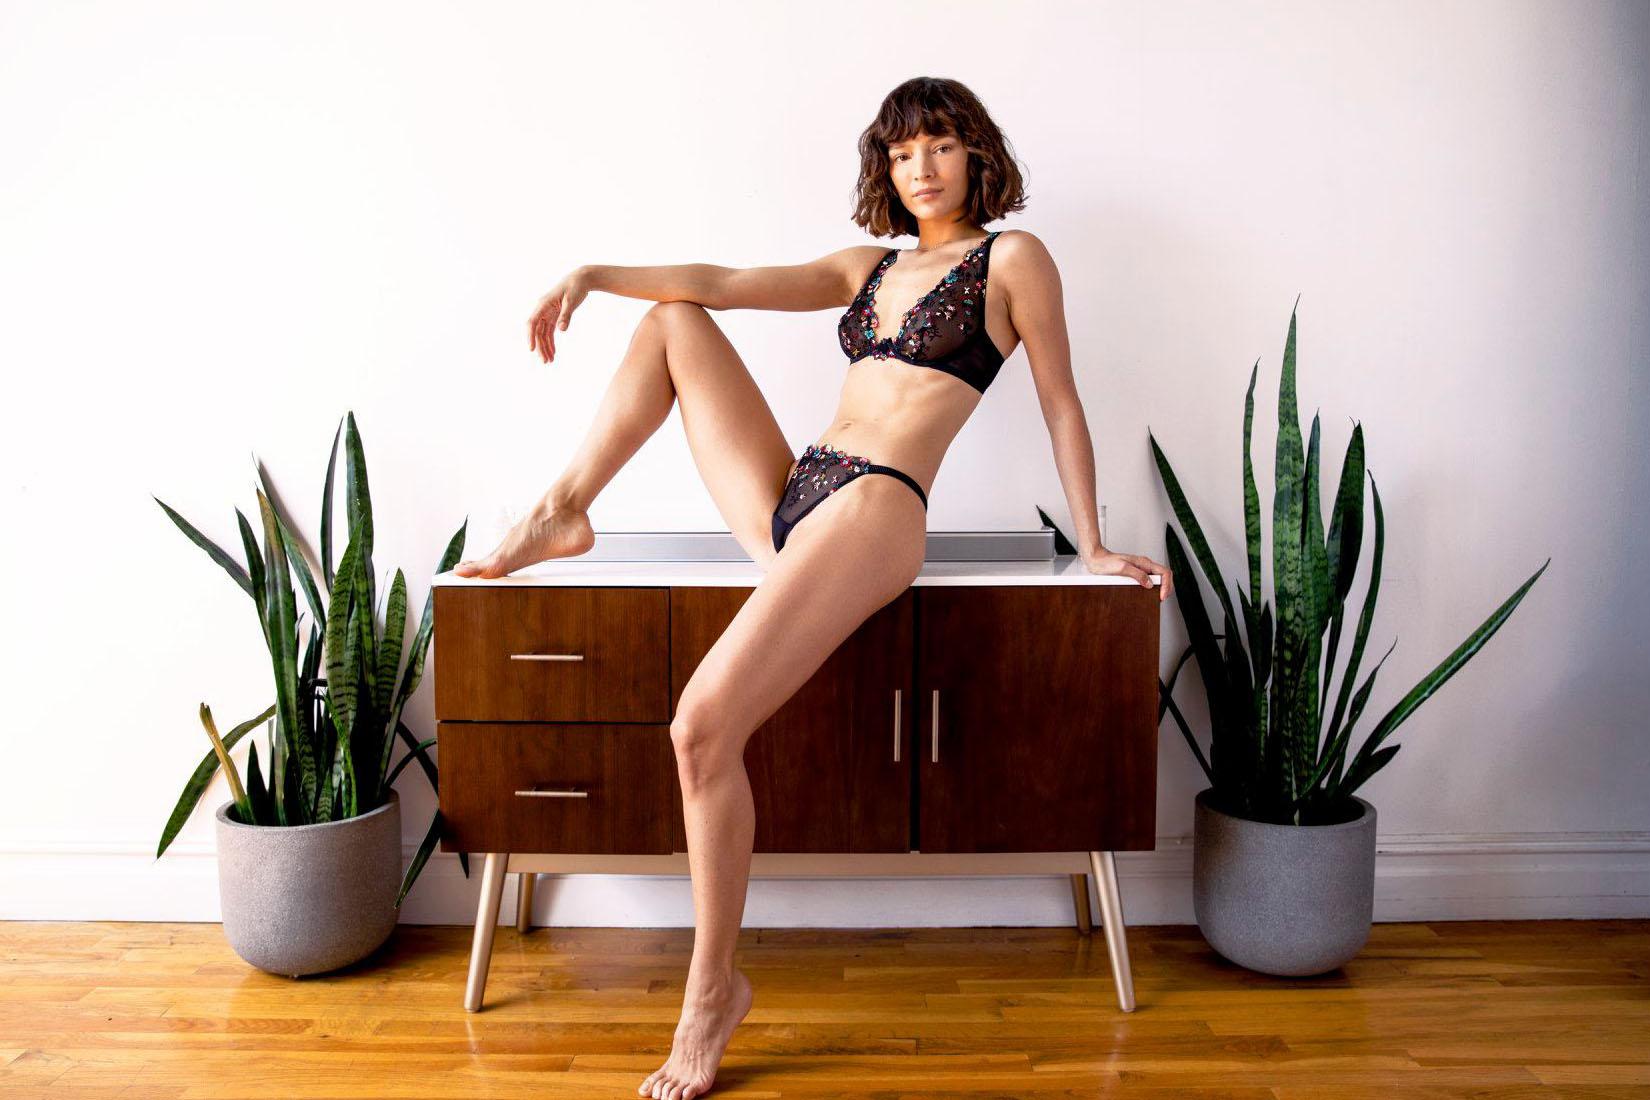 best lingerie brands Cosabella review Luxe Digital